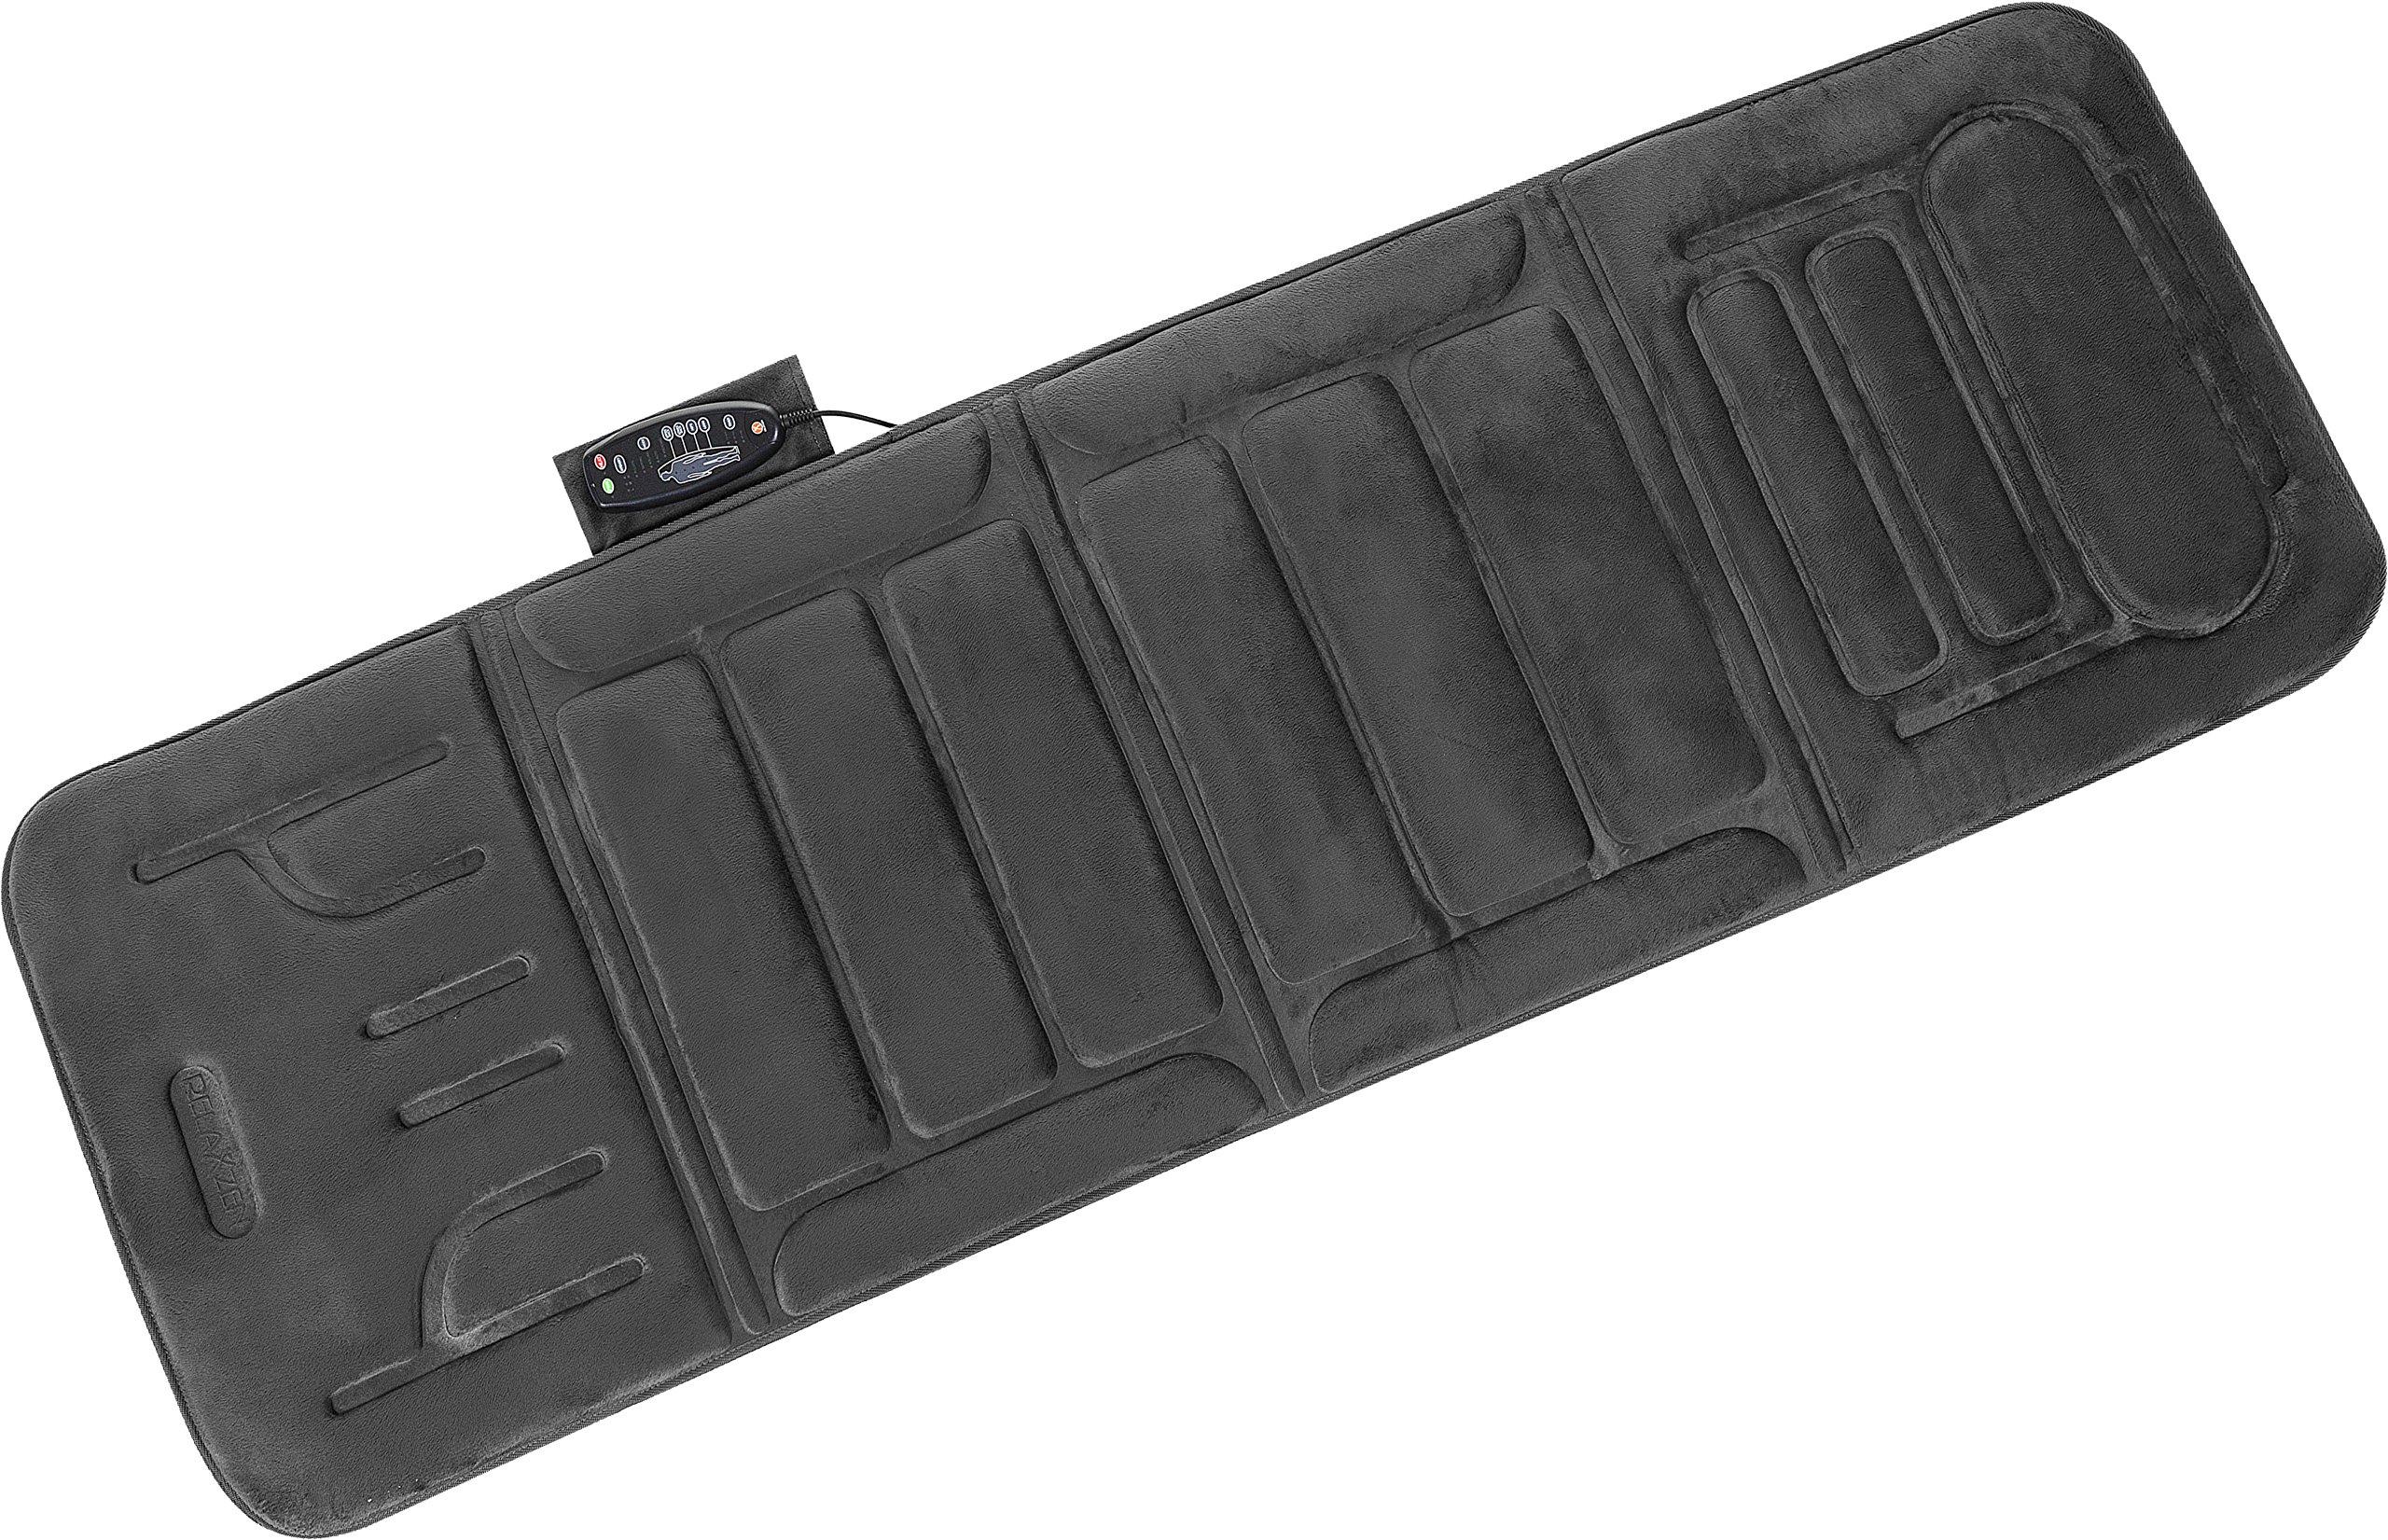 Relaxzen 10-Motor Massage Plush Mat with Heat and Extra Foam, Gray